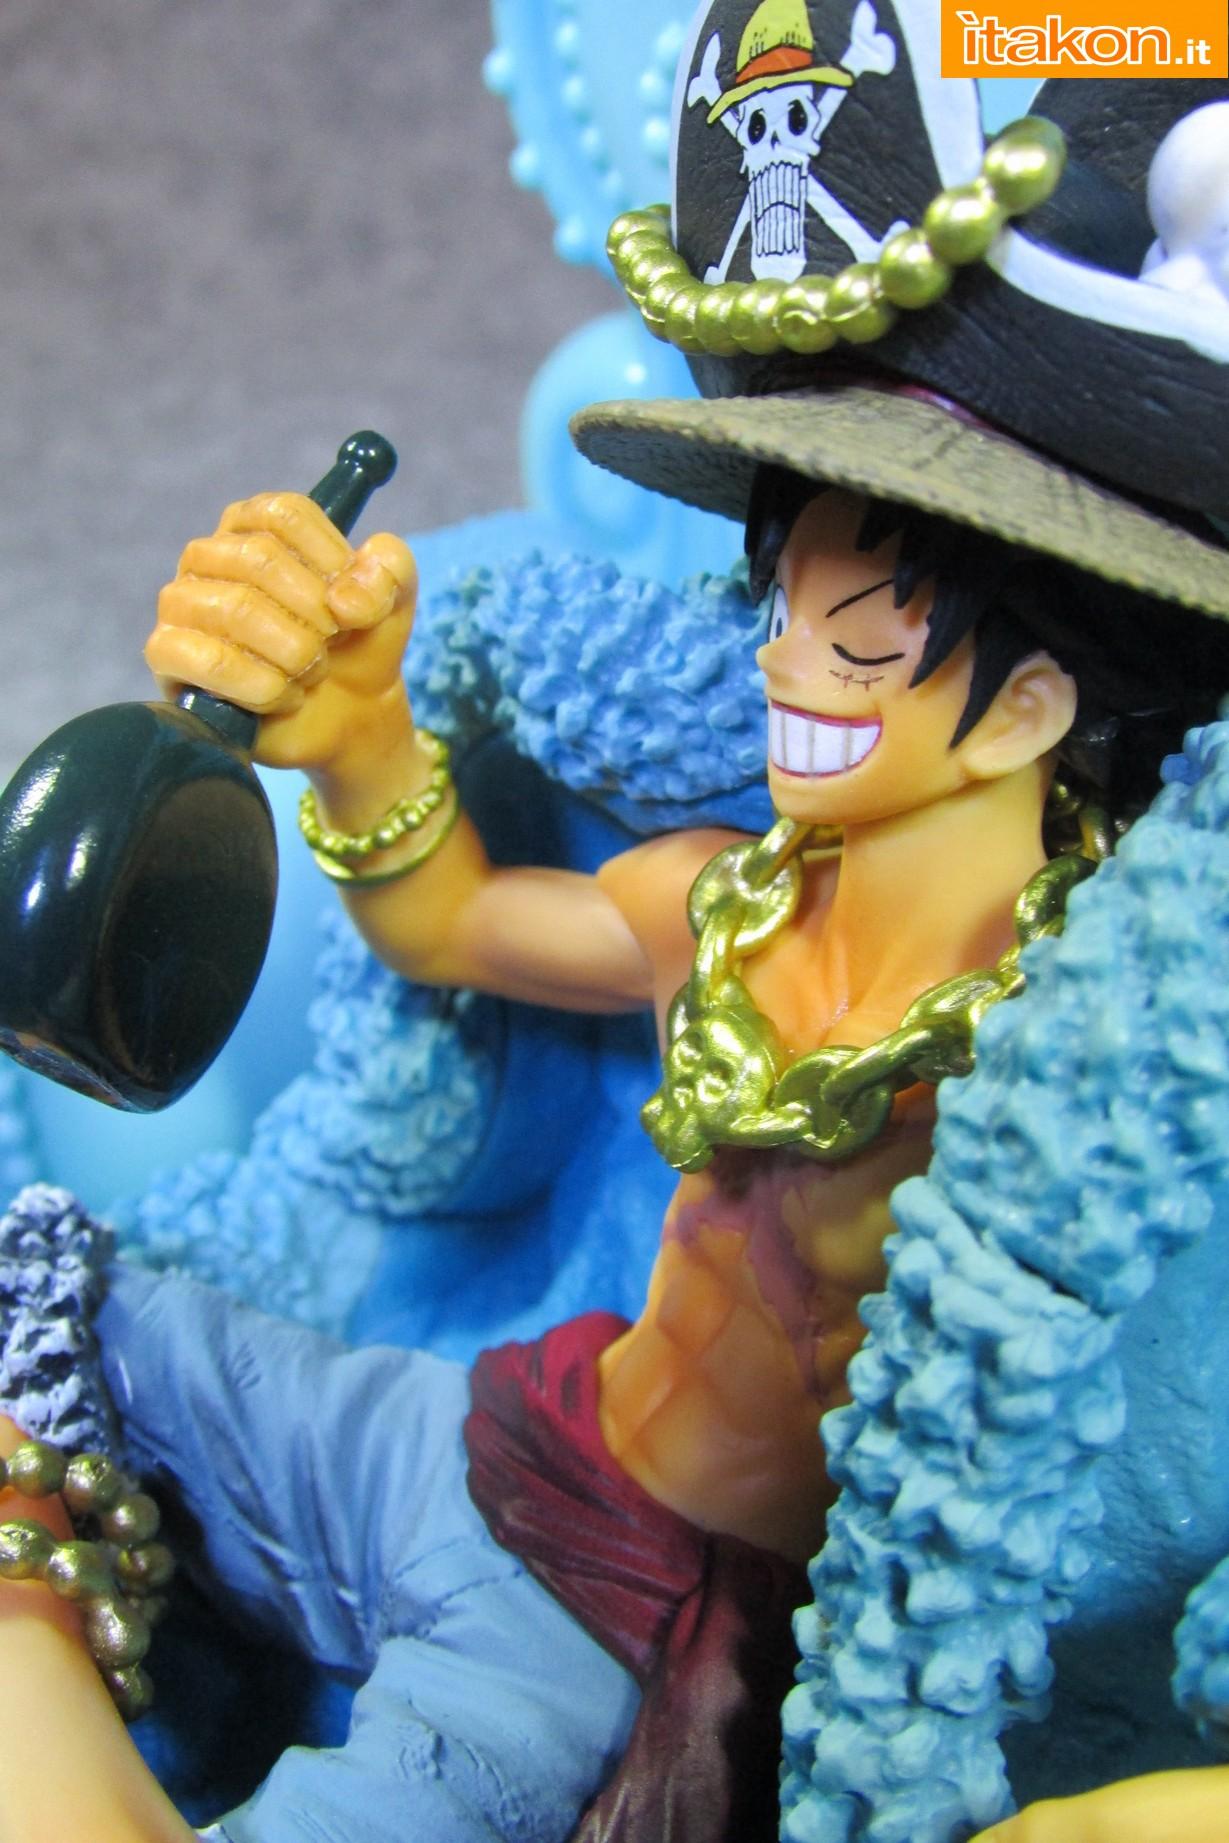 Link a Recensione Review Monkey D. Luffy One Piece 20th Anniversary ver. Figuarts ZERO di Bandai 47